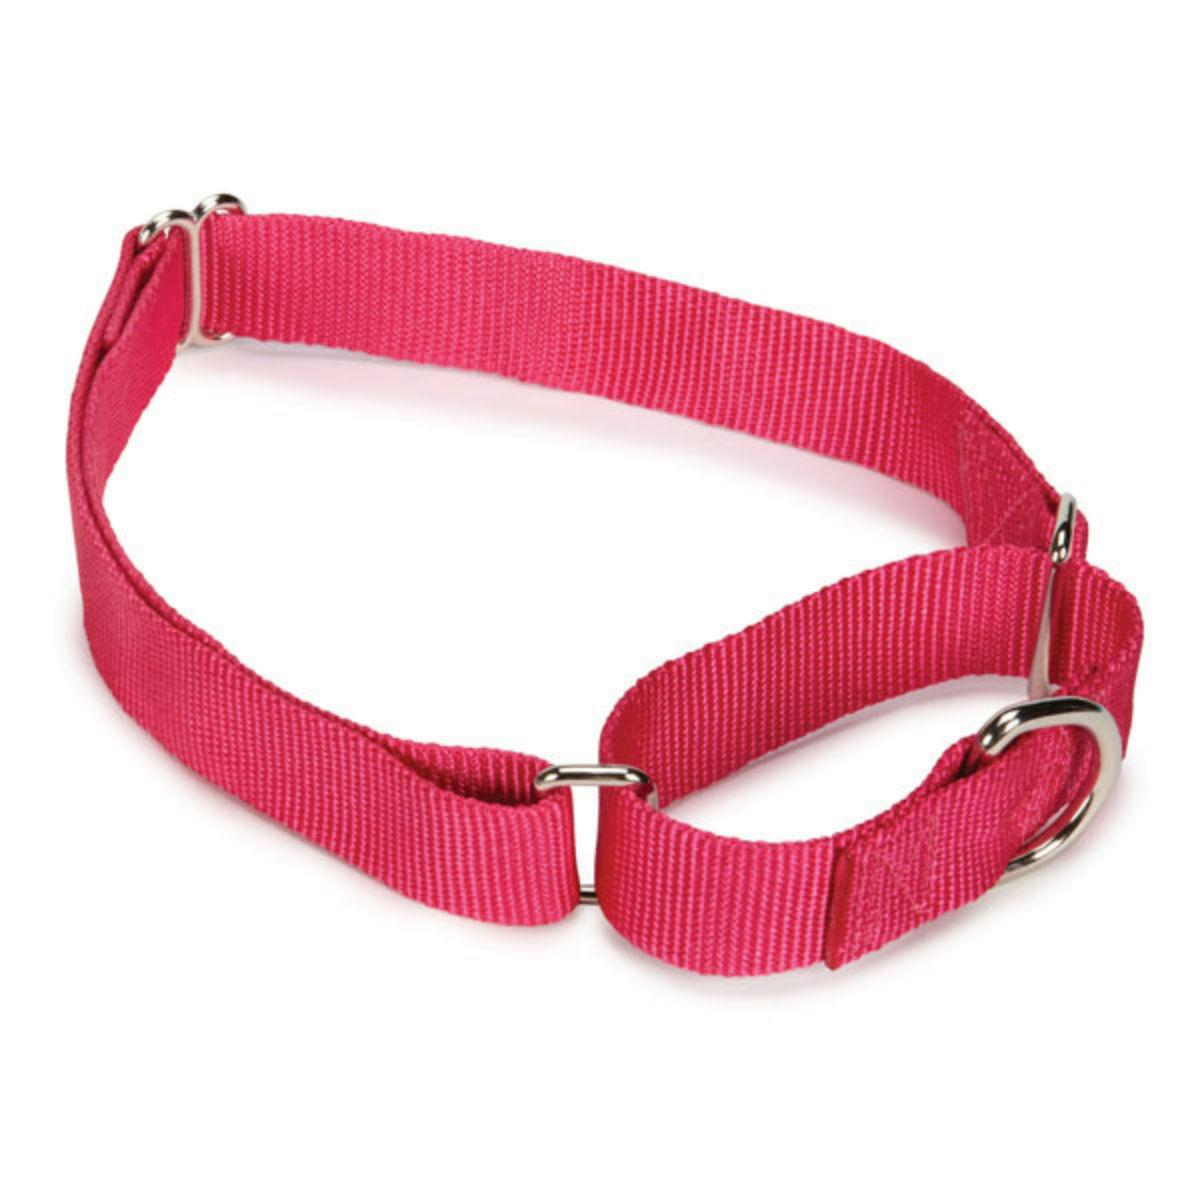 Guardian Gear Nylon Martingale Dog Collar - Raspberry